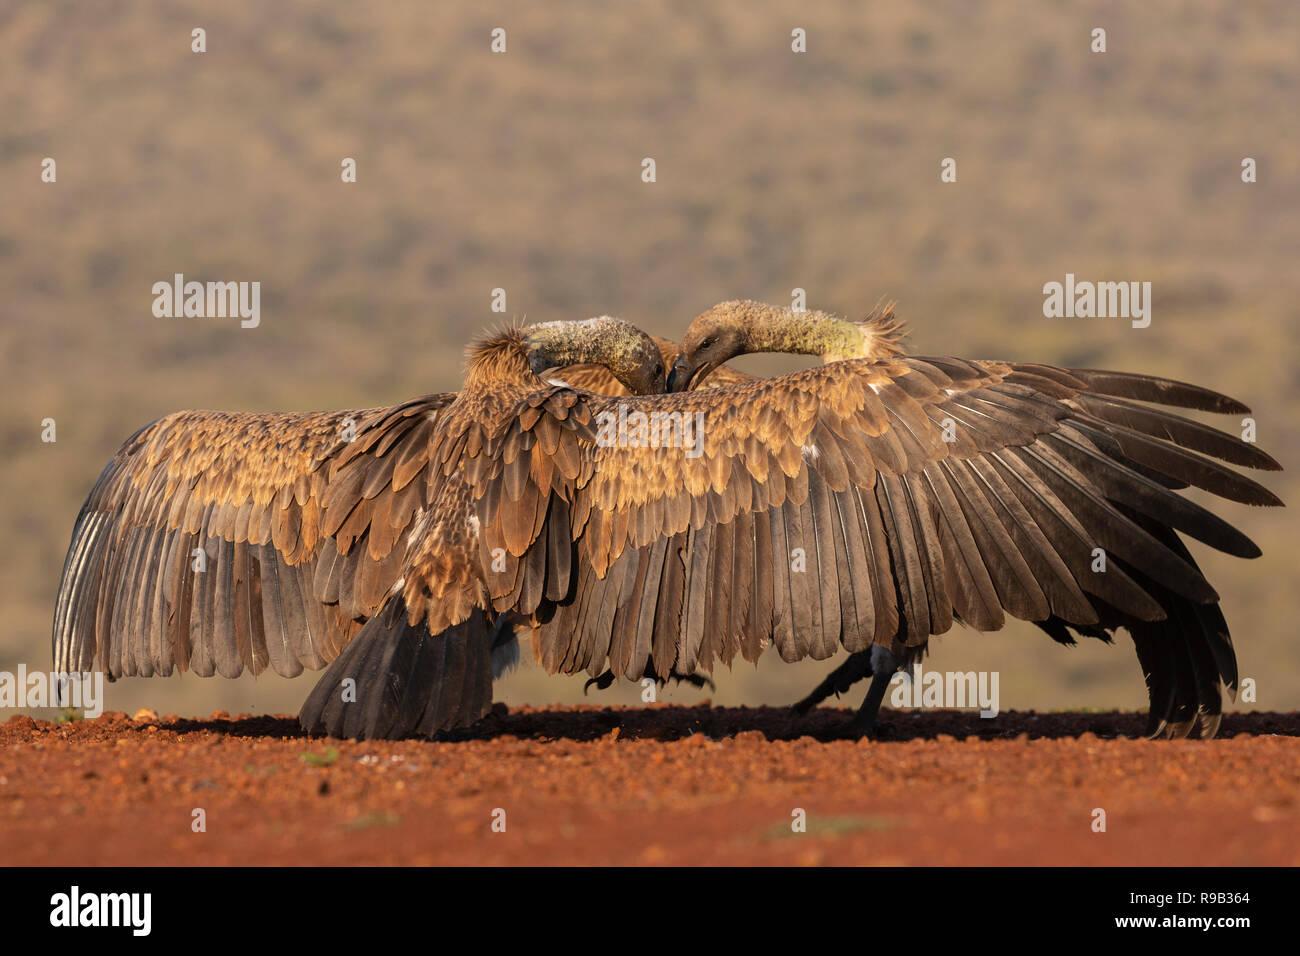 Whitebacked Geier (Tylose in Africanus) in Konfrontation, Zimanga Private Game Reserve, KwaZulu-Natal, Südafrika Stockbild